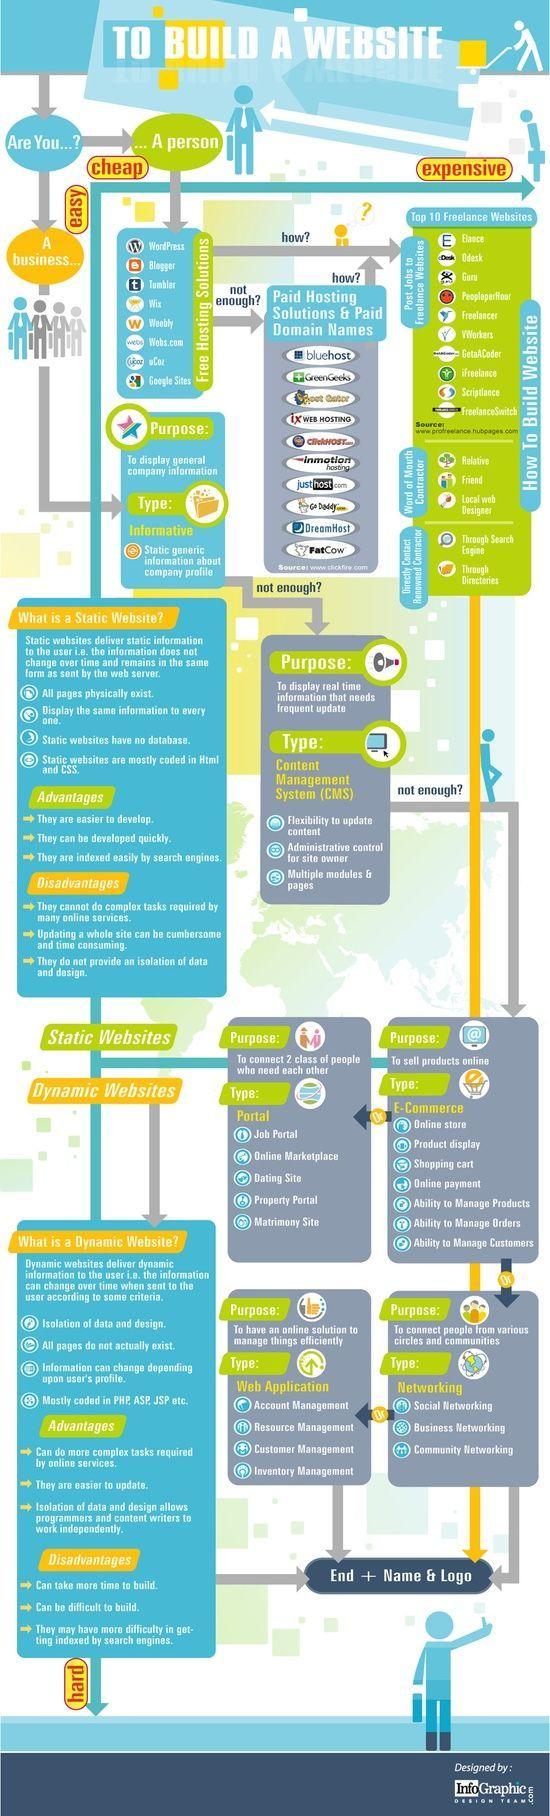 Pin by Yicela Vega Silva on coding | Pinterest | Web development ...